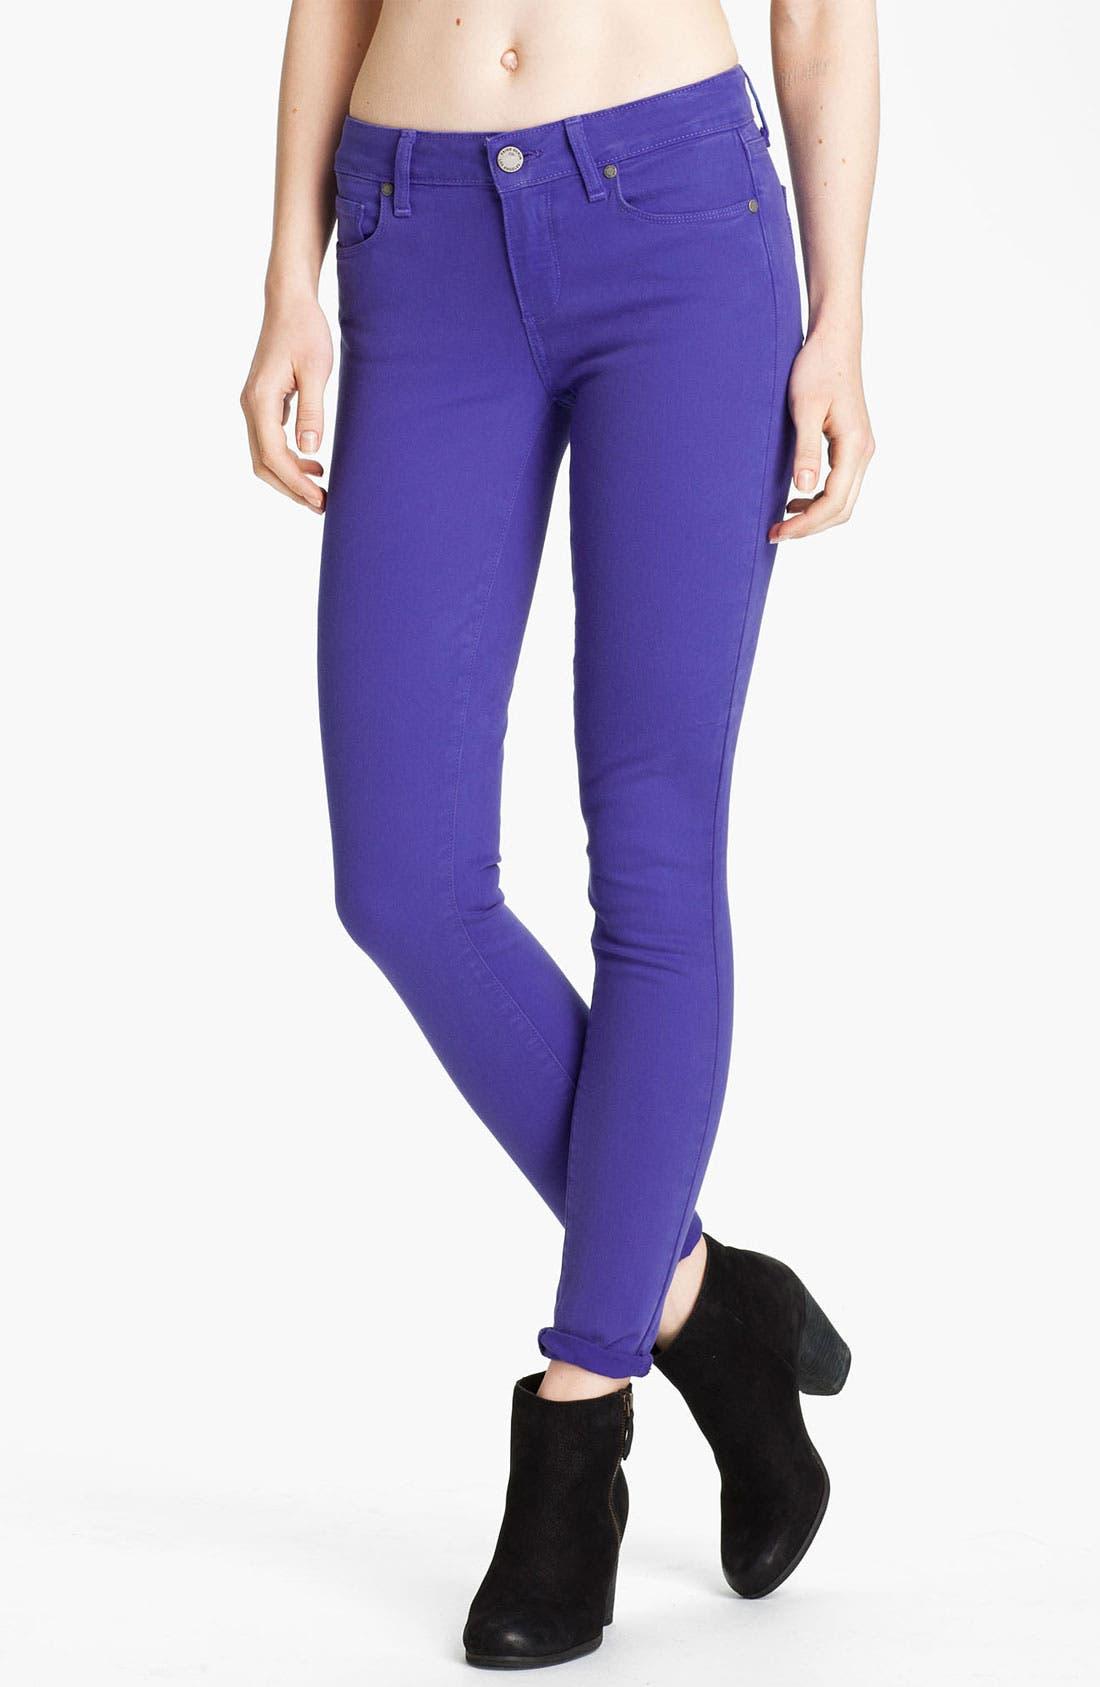 Alternate Image 1 Selected - Paige Denim 'Verdugo' Skinny Stretch Denim Jeans (Violet Blue)